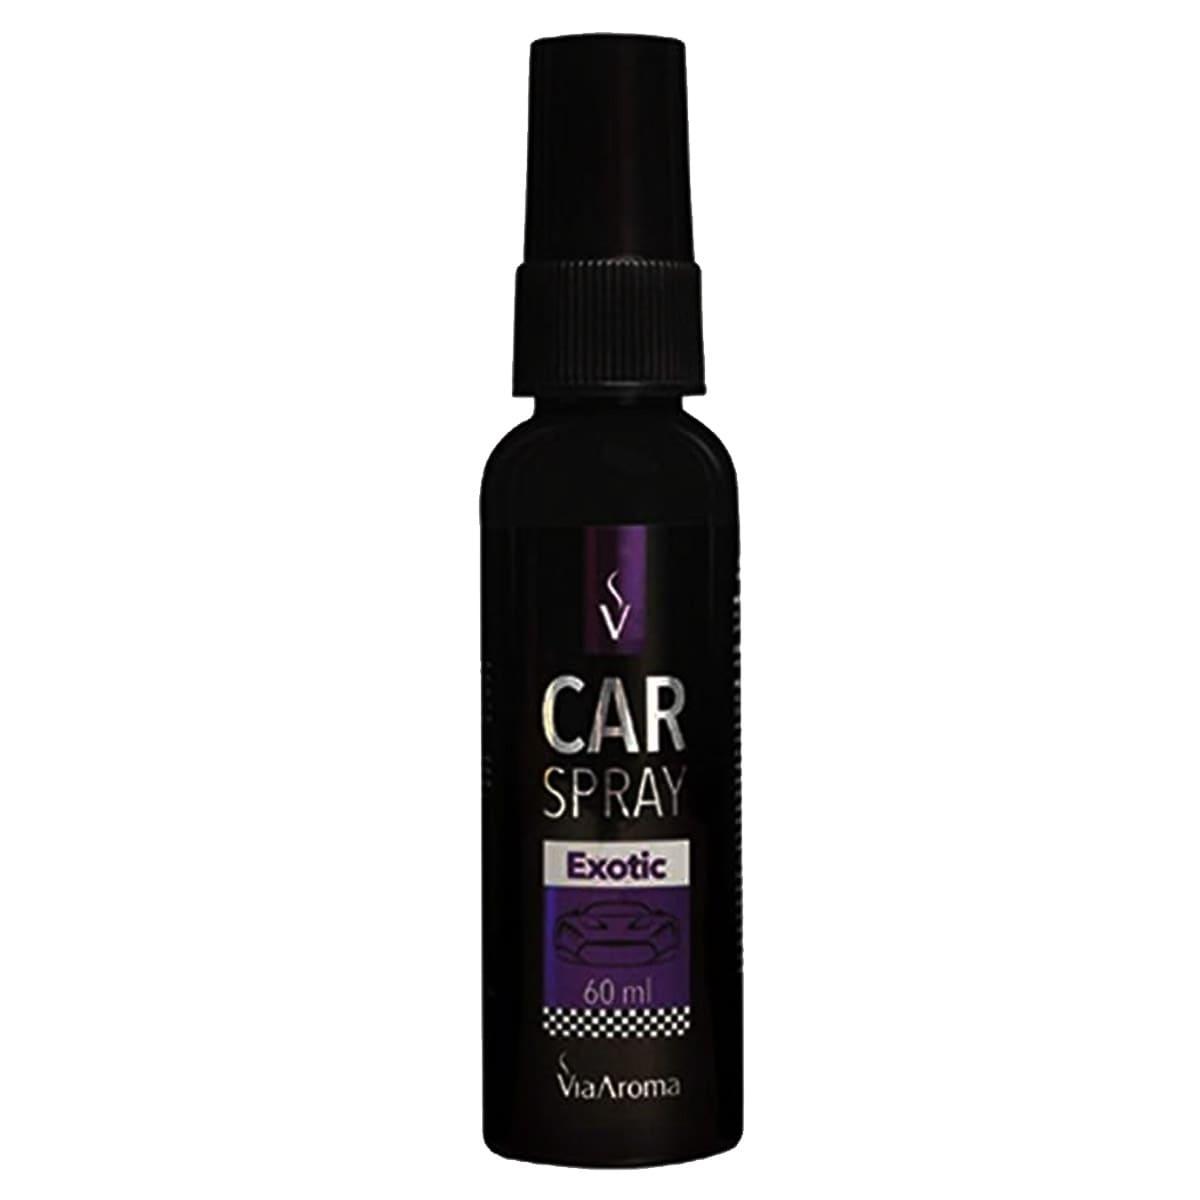 Car spray exotic 60ml